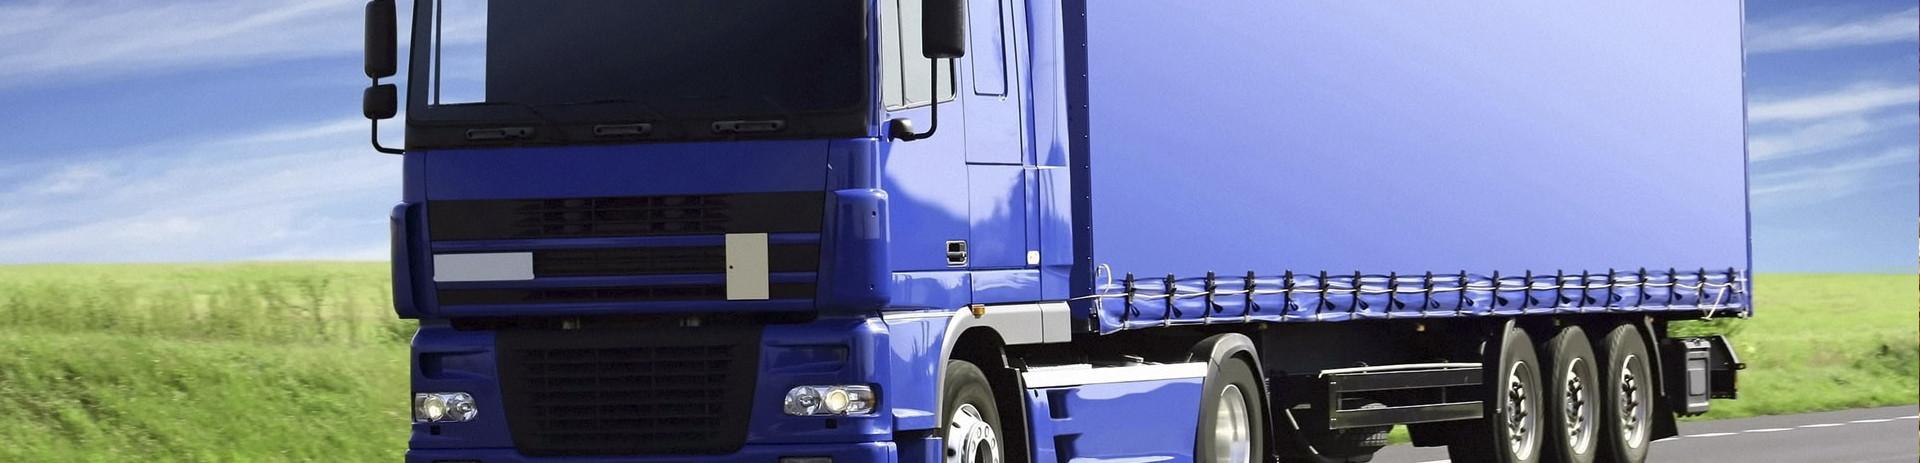 truck-f9a5c676e3-3000 copy2